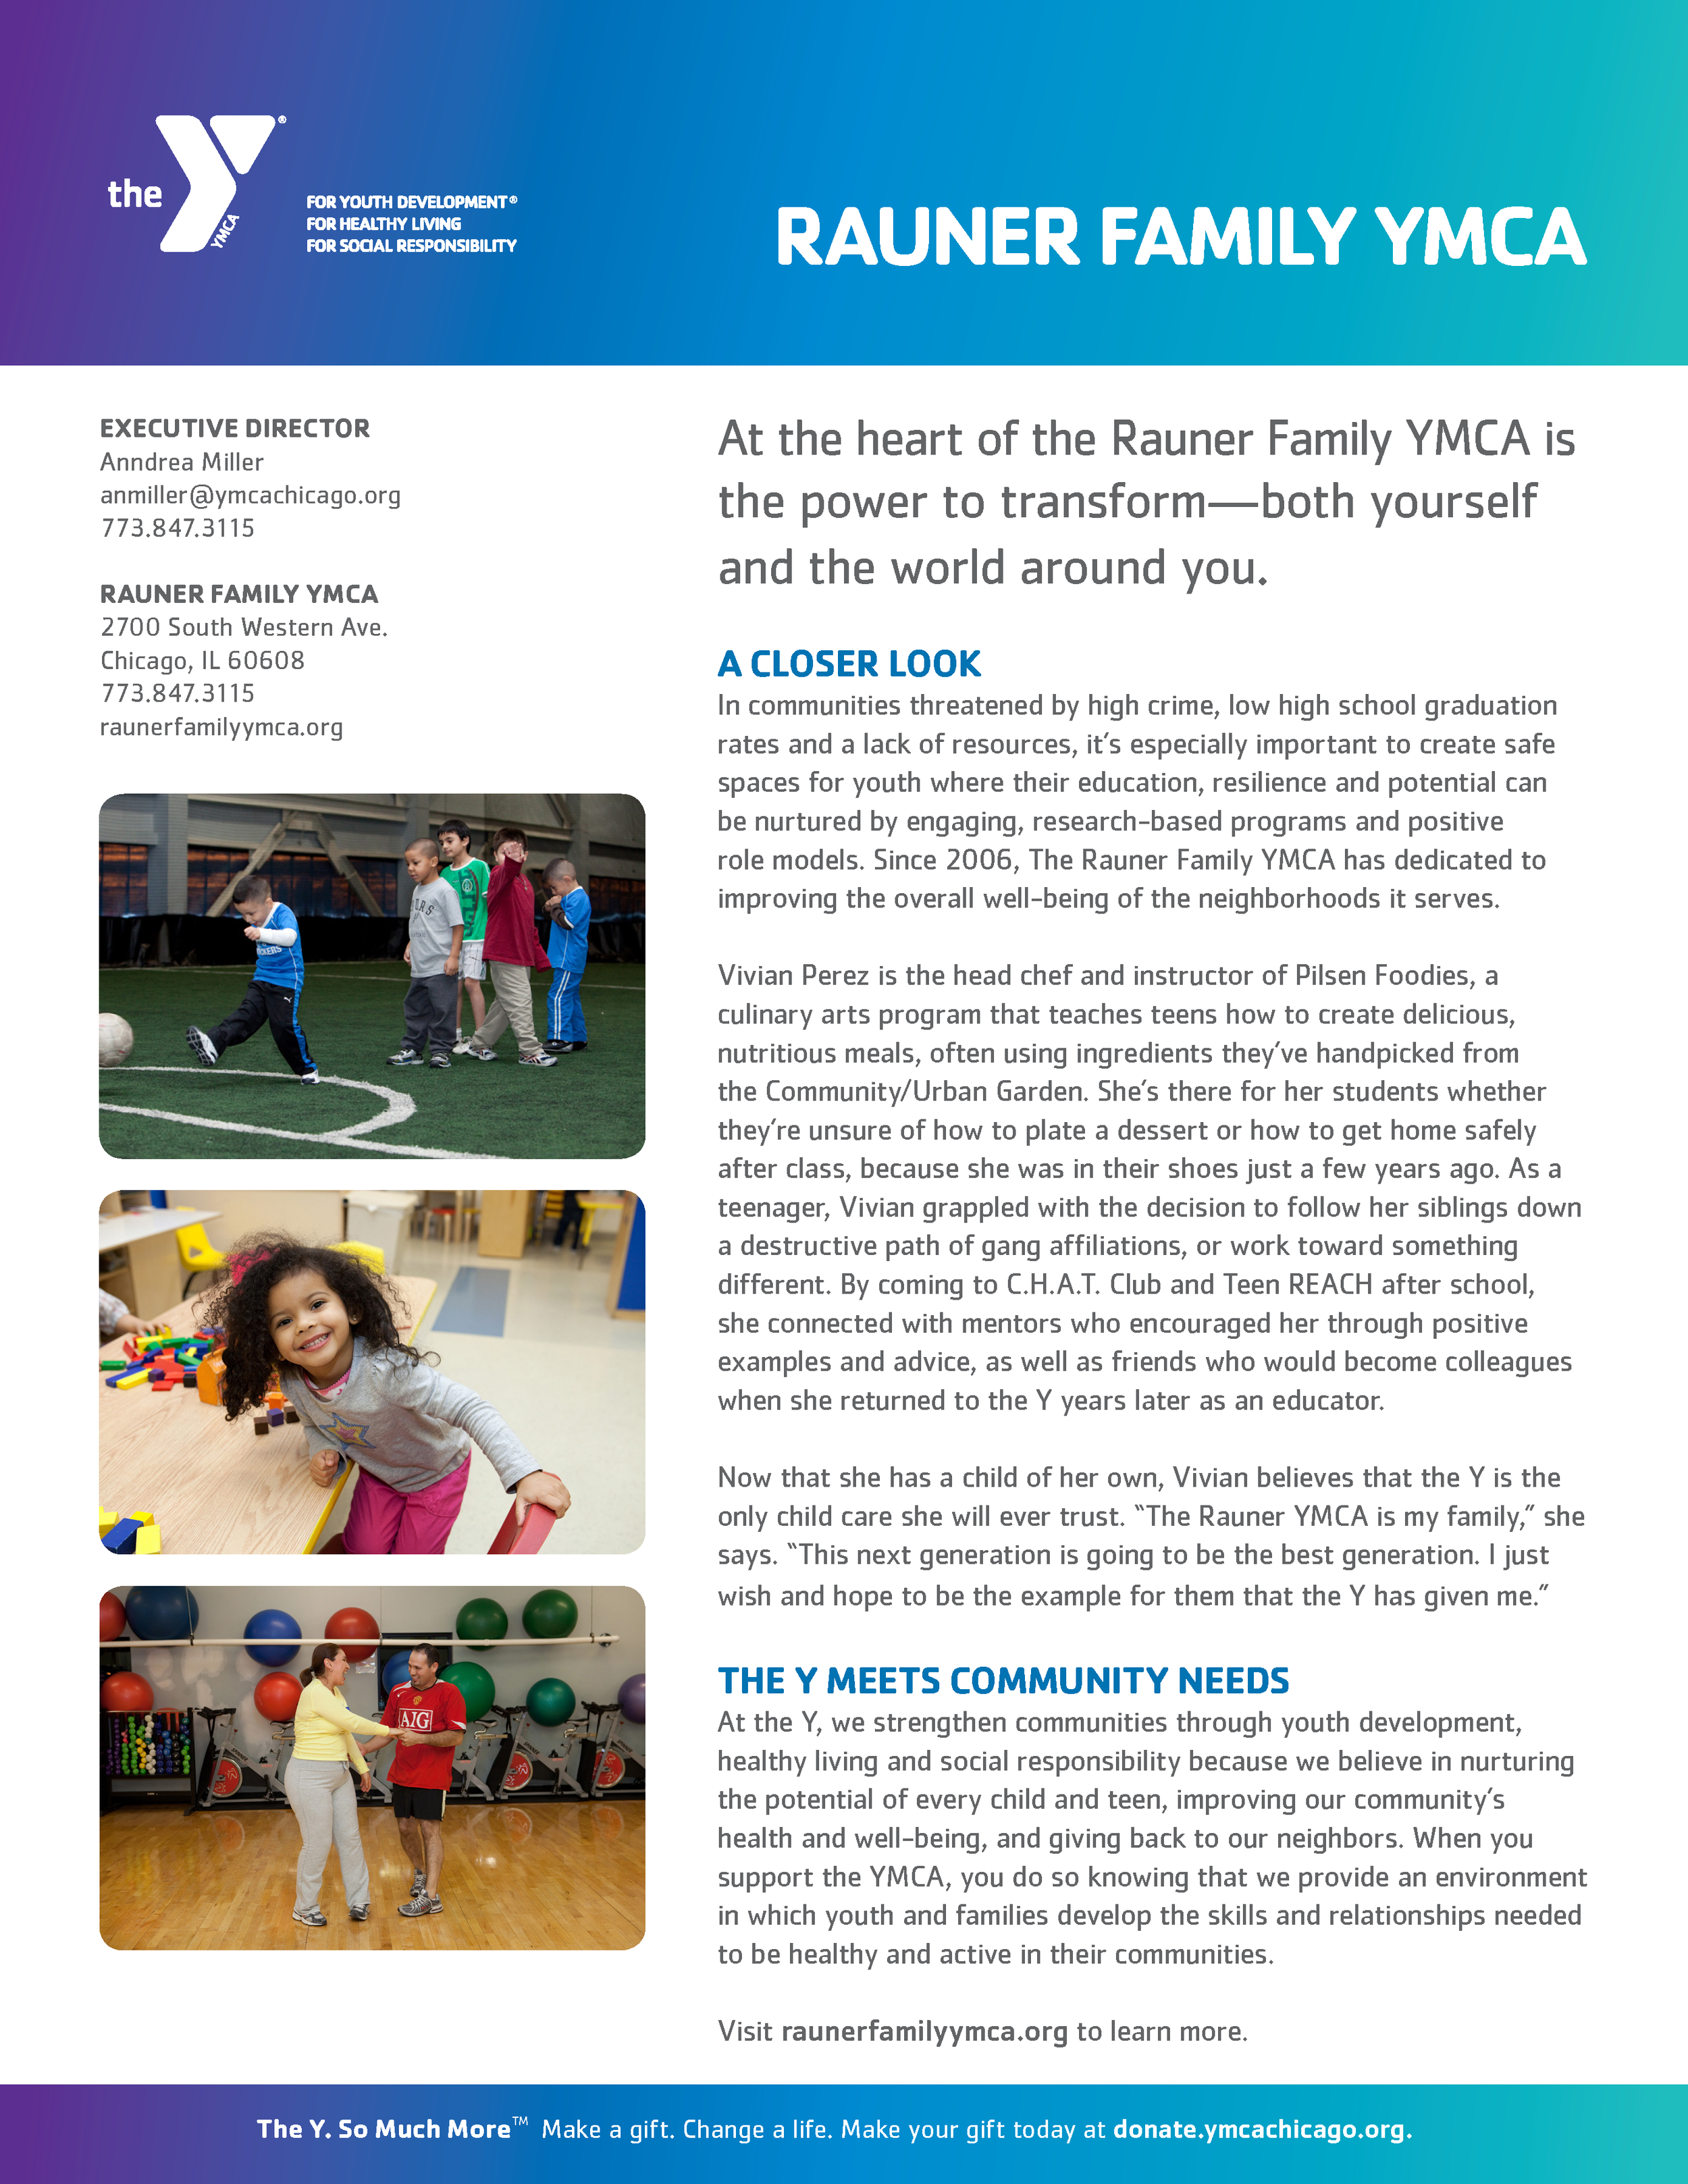 Rauner Family YMCA one-sheet, side 1